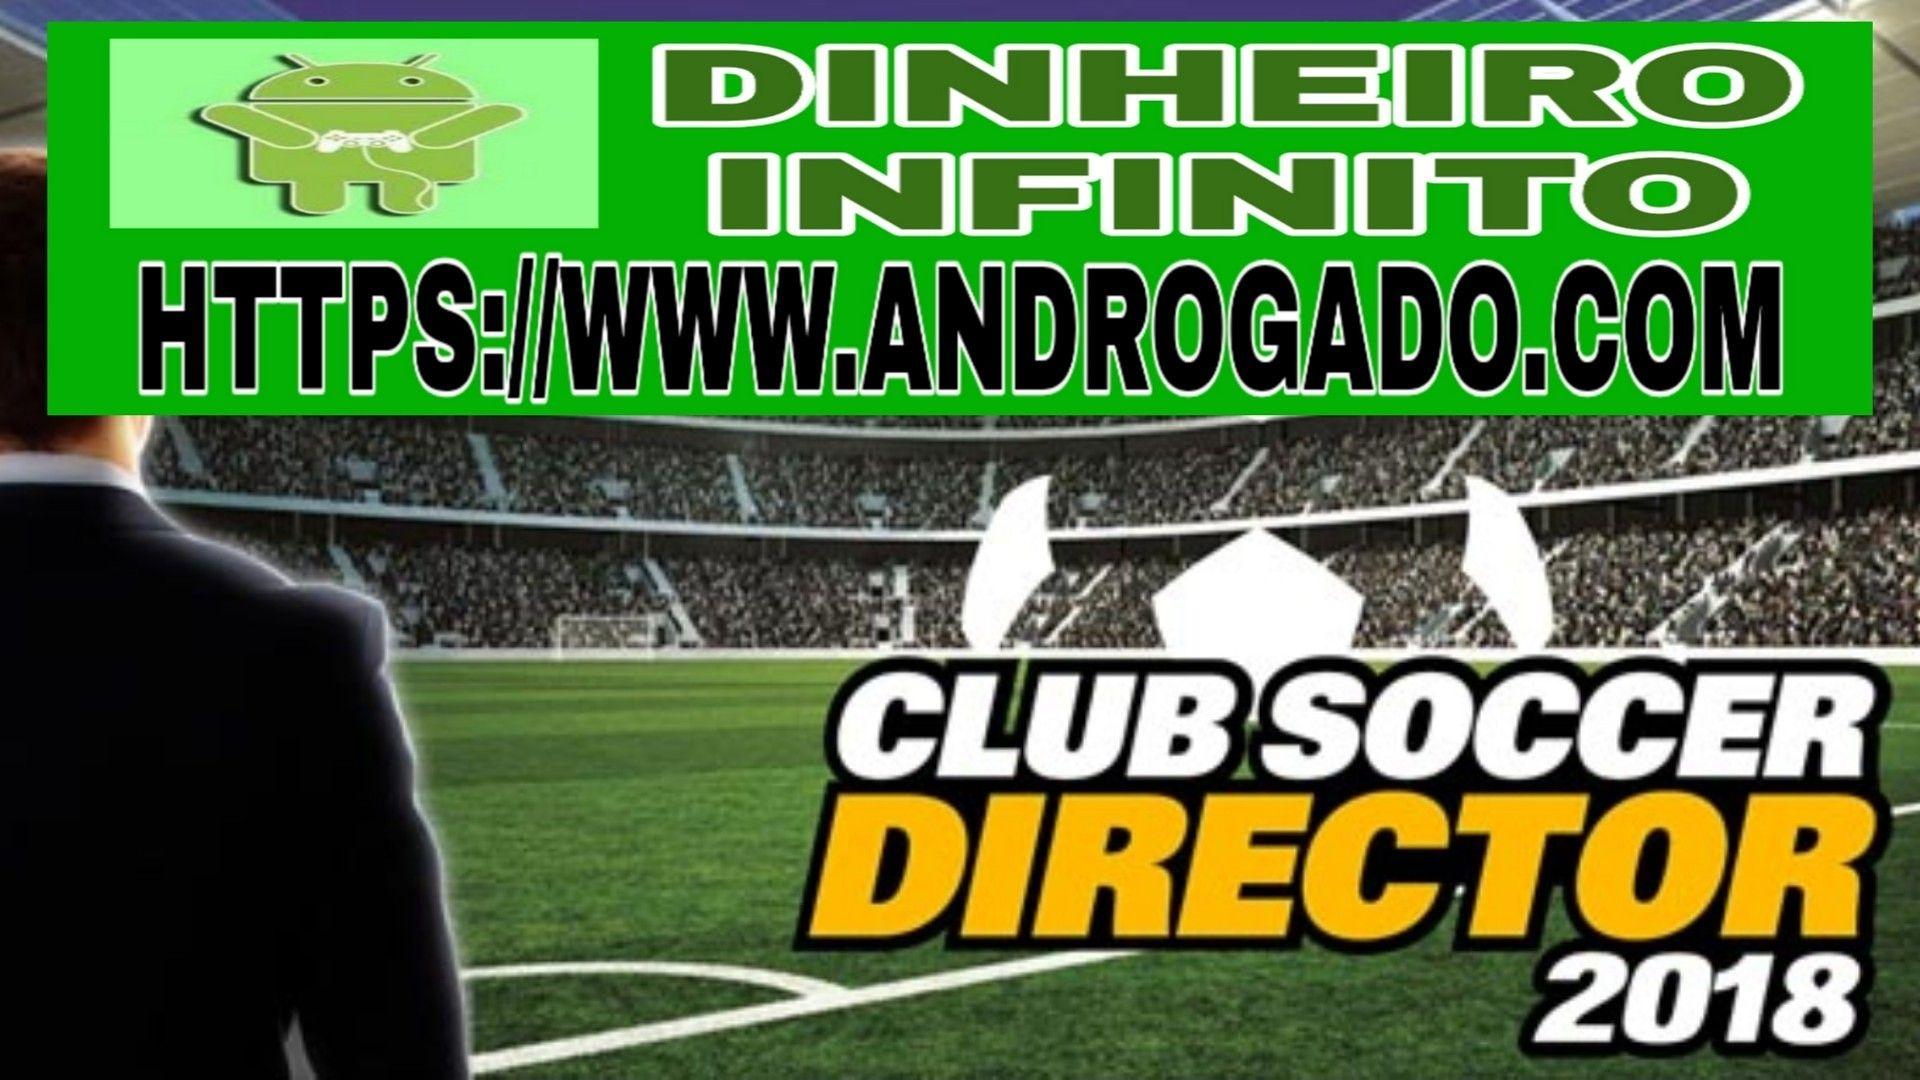 Club Soccer Director 2018 Football Club Manager V2 0 7 Apk Mod